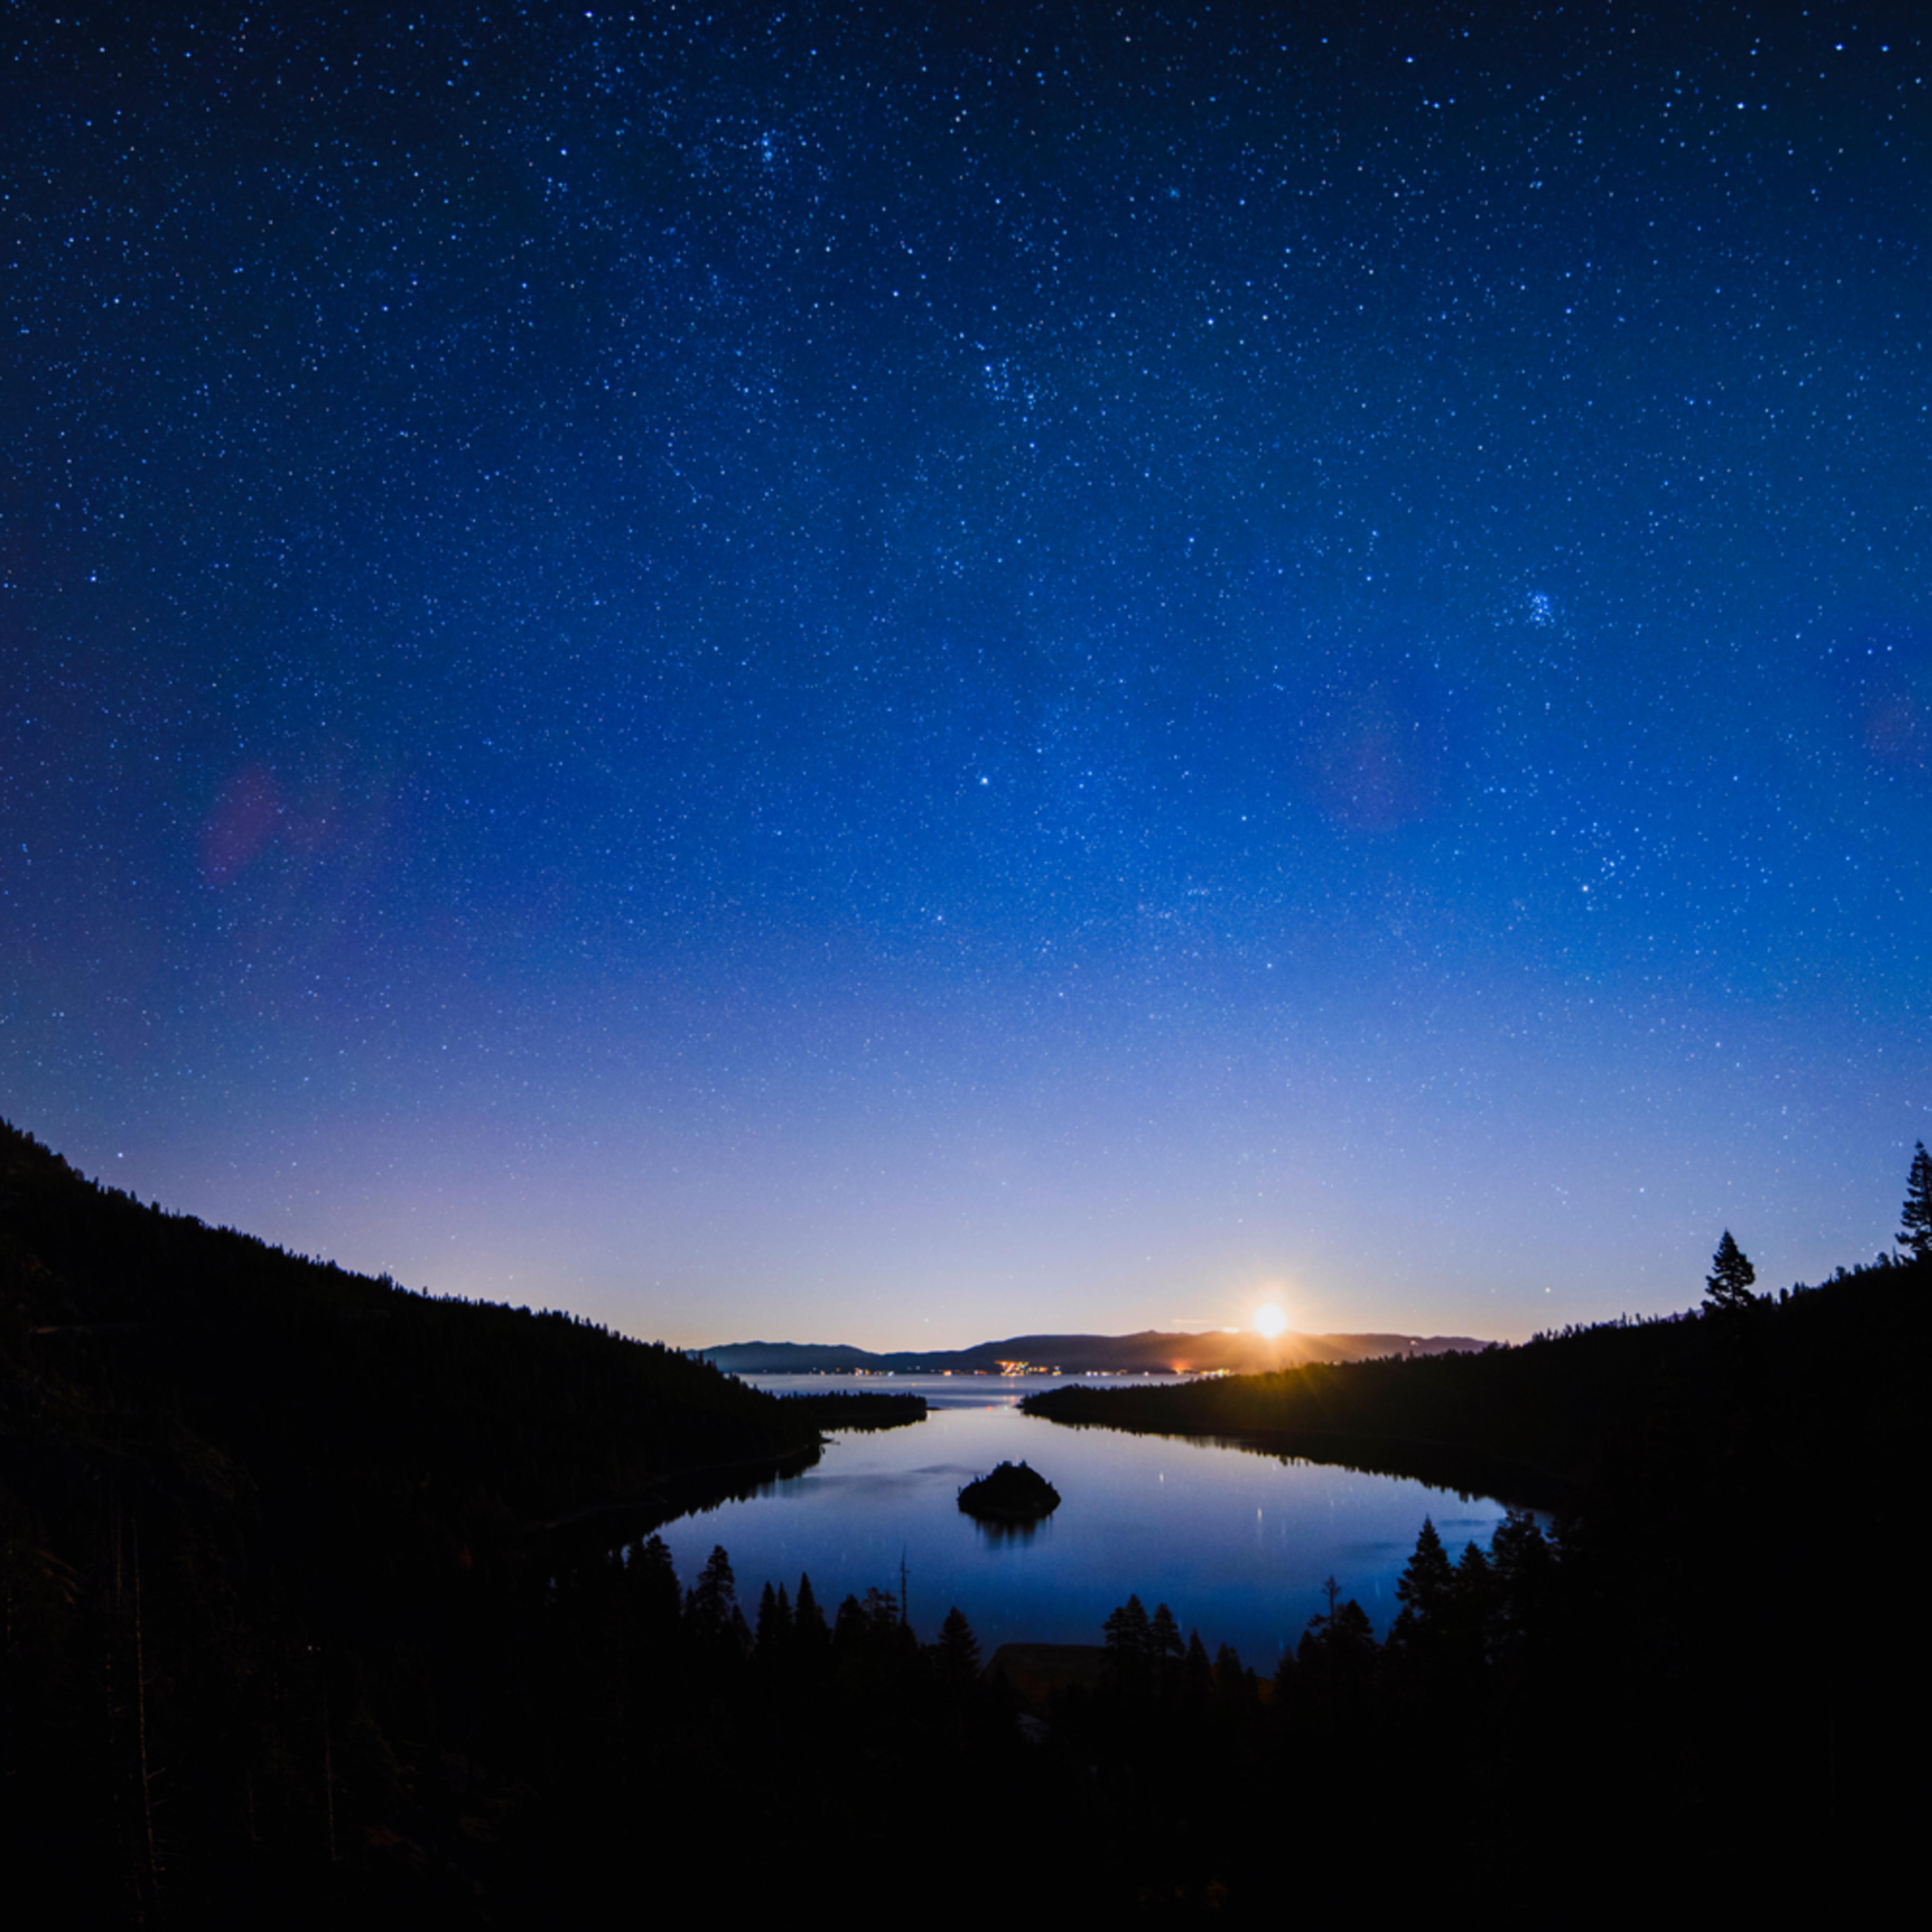 Emerald bay moonrise nbvwi7